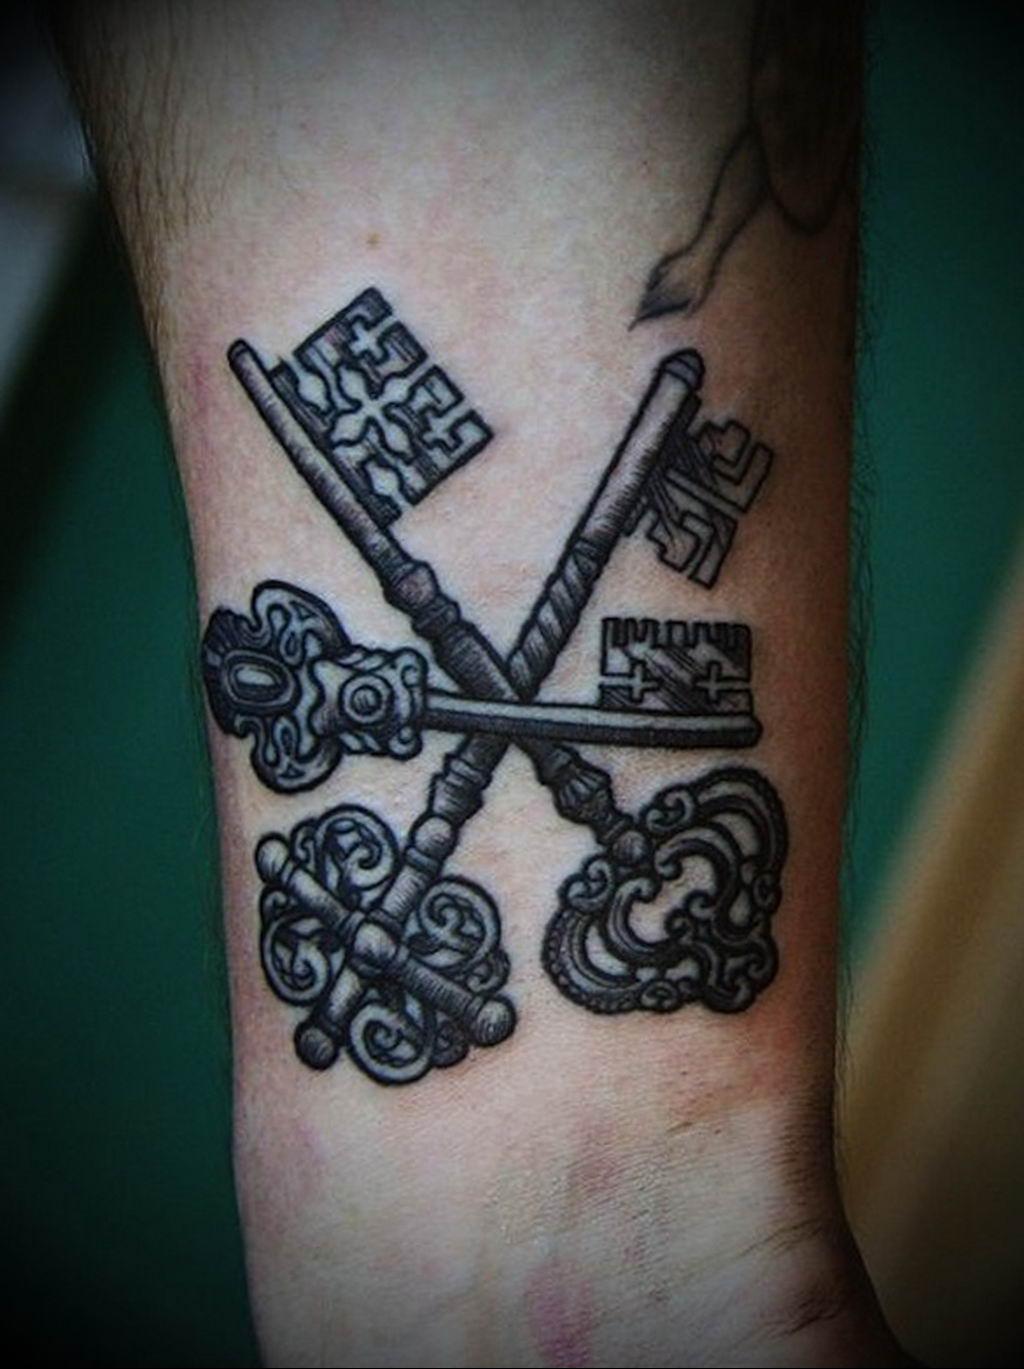 Фото тату ключ на запястье 21.08.2019 №035 - tattoo key on the wrist - tatufoto.com